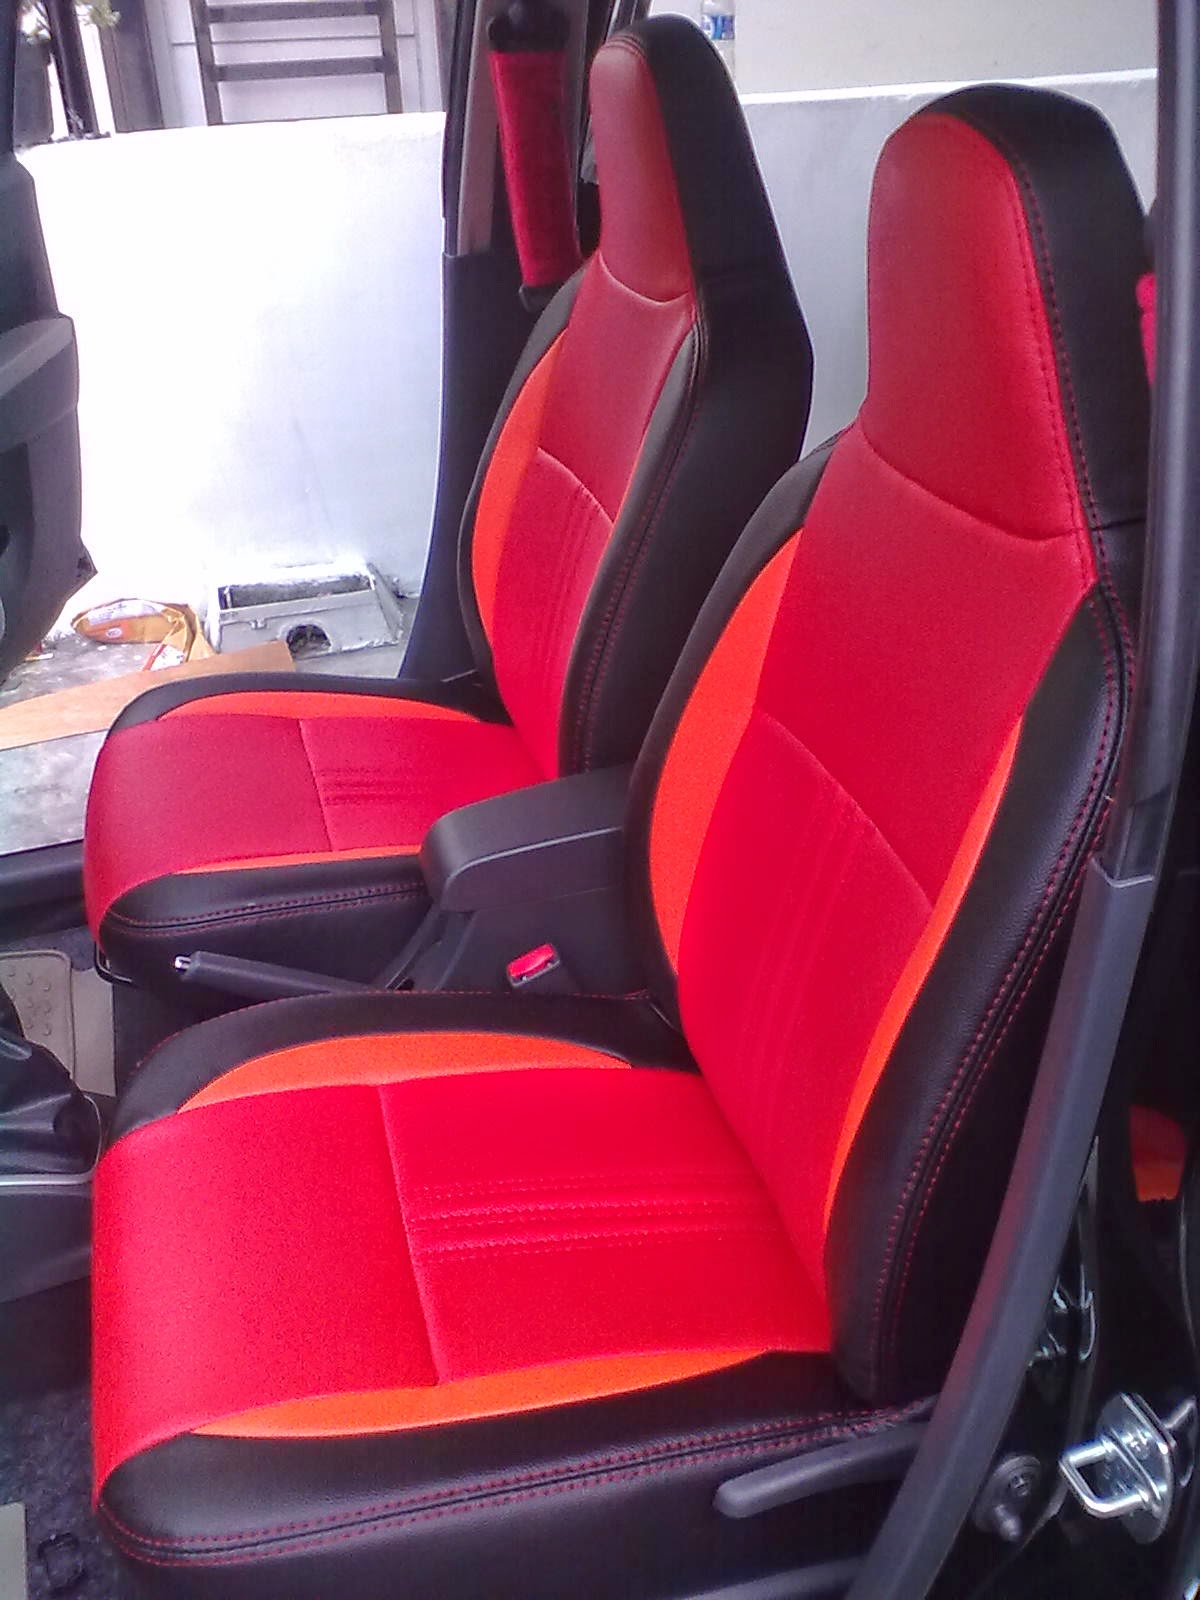 sarung jok mobil daihatsu ayla hitam merah - medan jok mobil